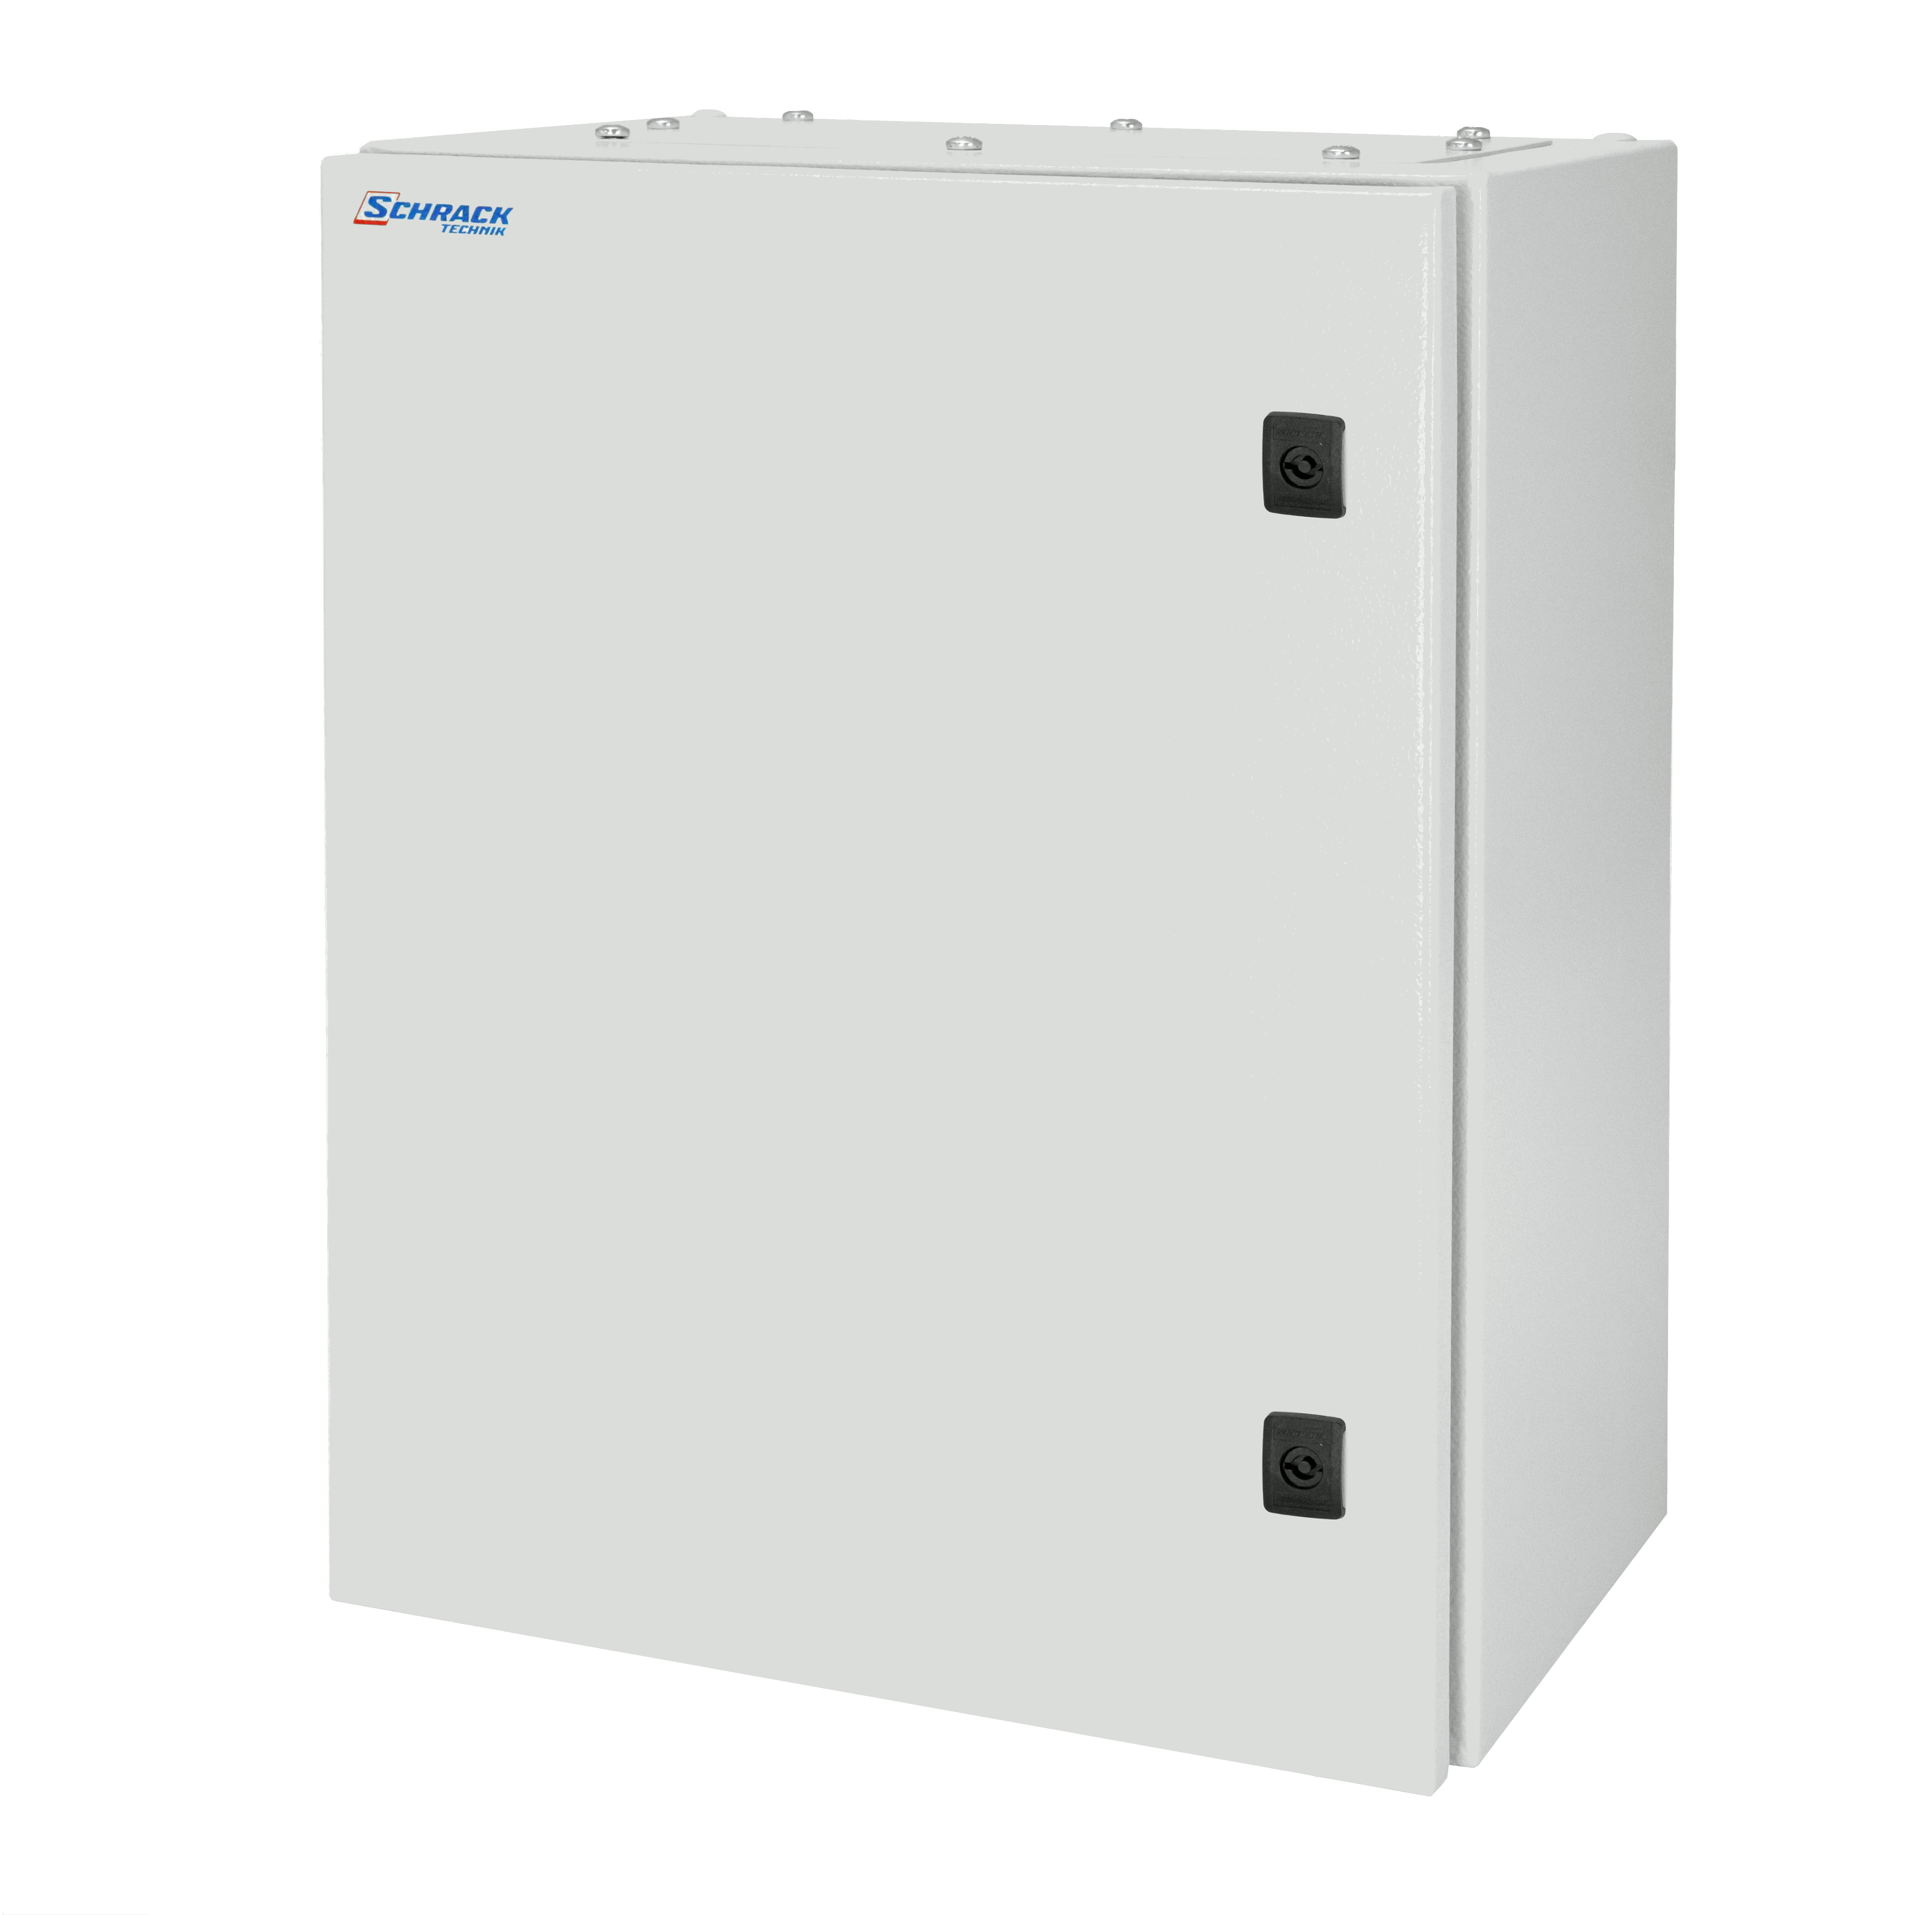 1 Stk Wandschrank Mono IP66 H=600 B=500 T=210 Stahlblech WSM6050210